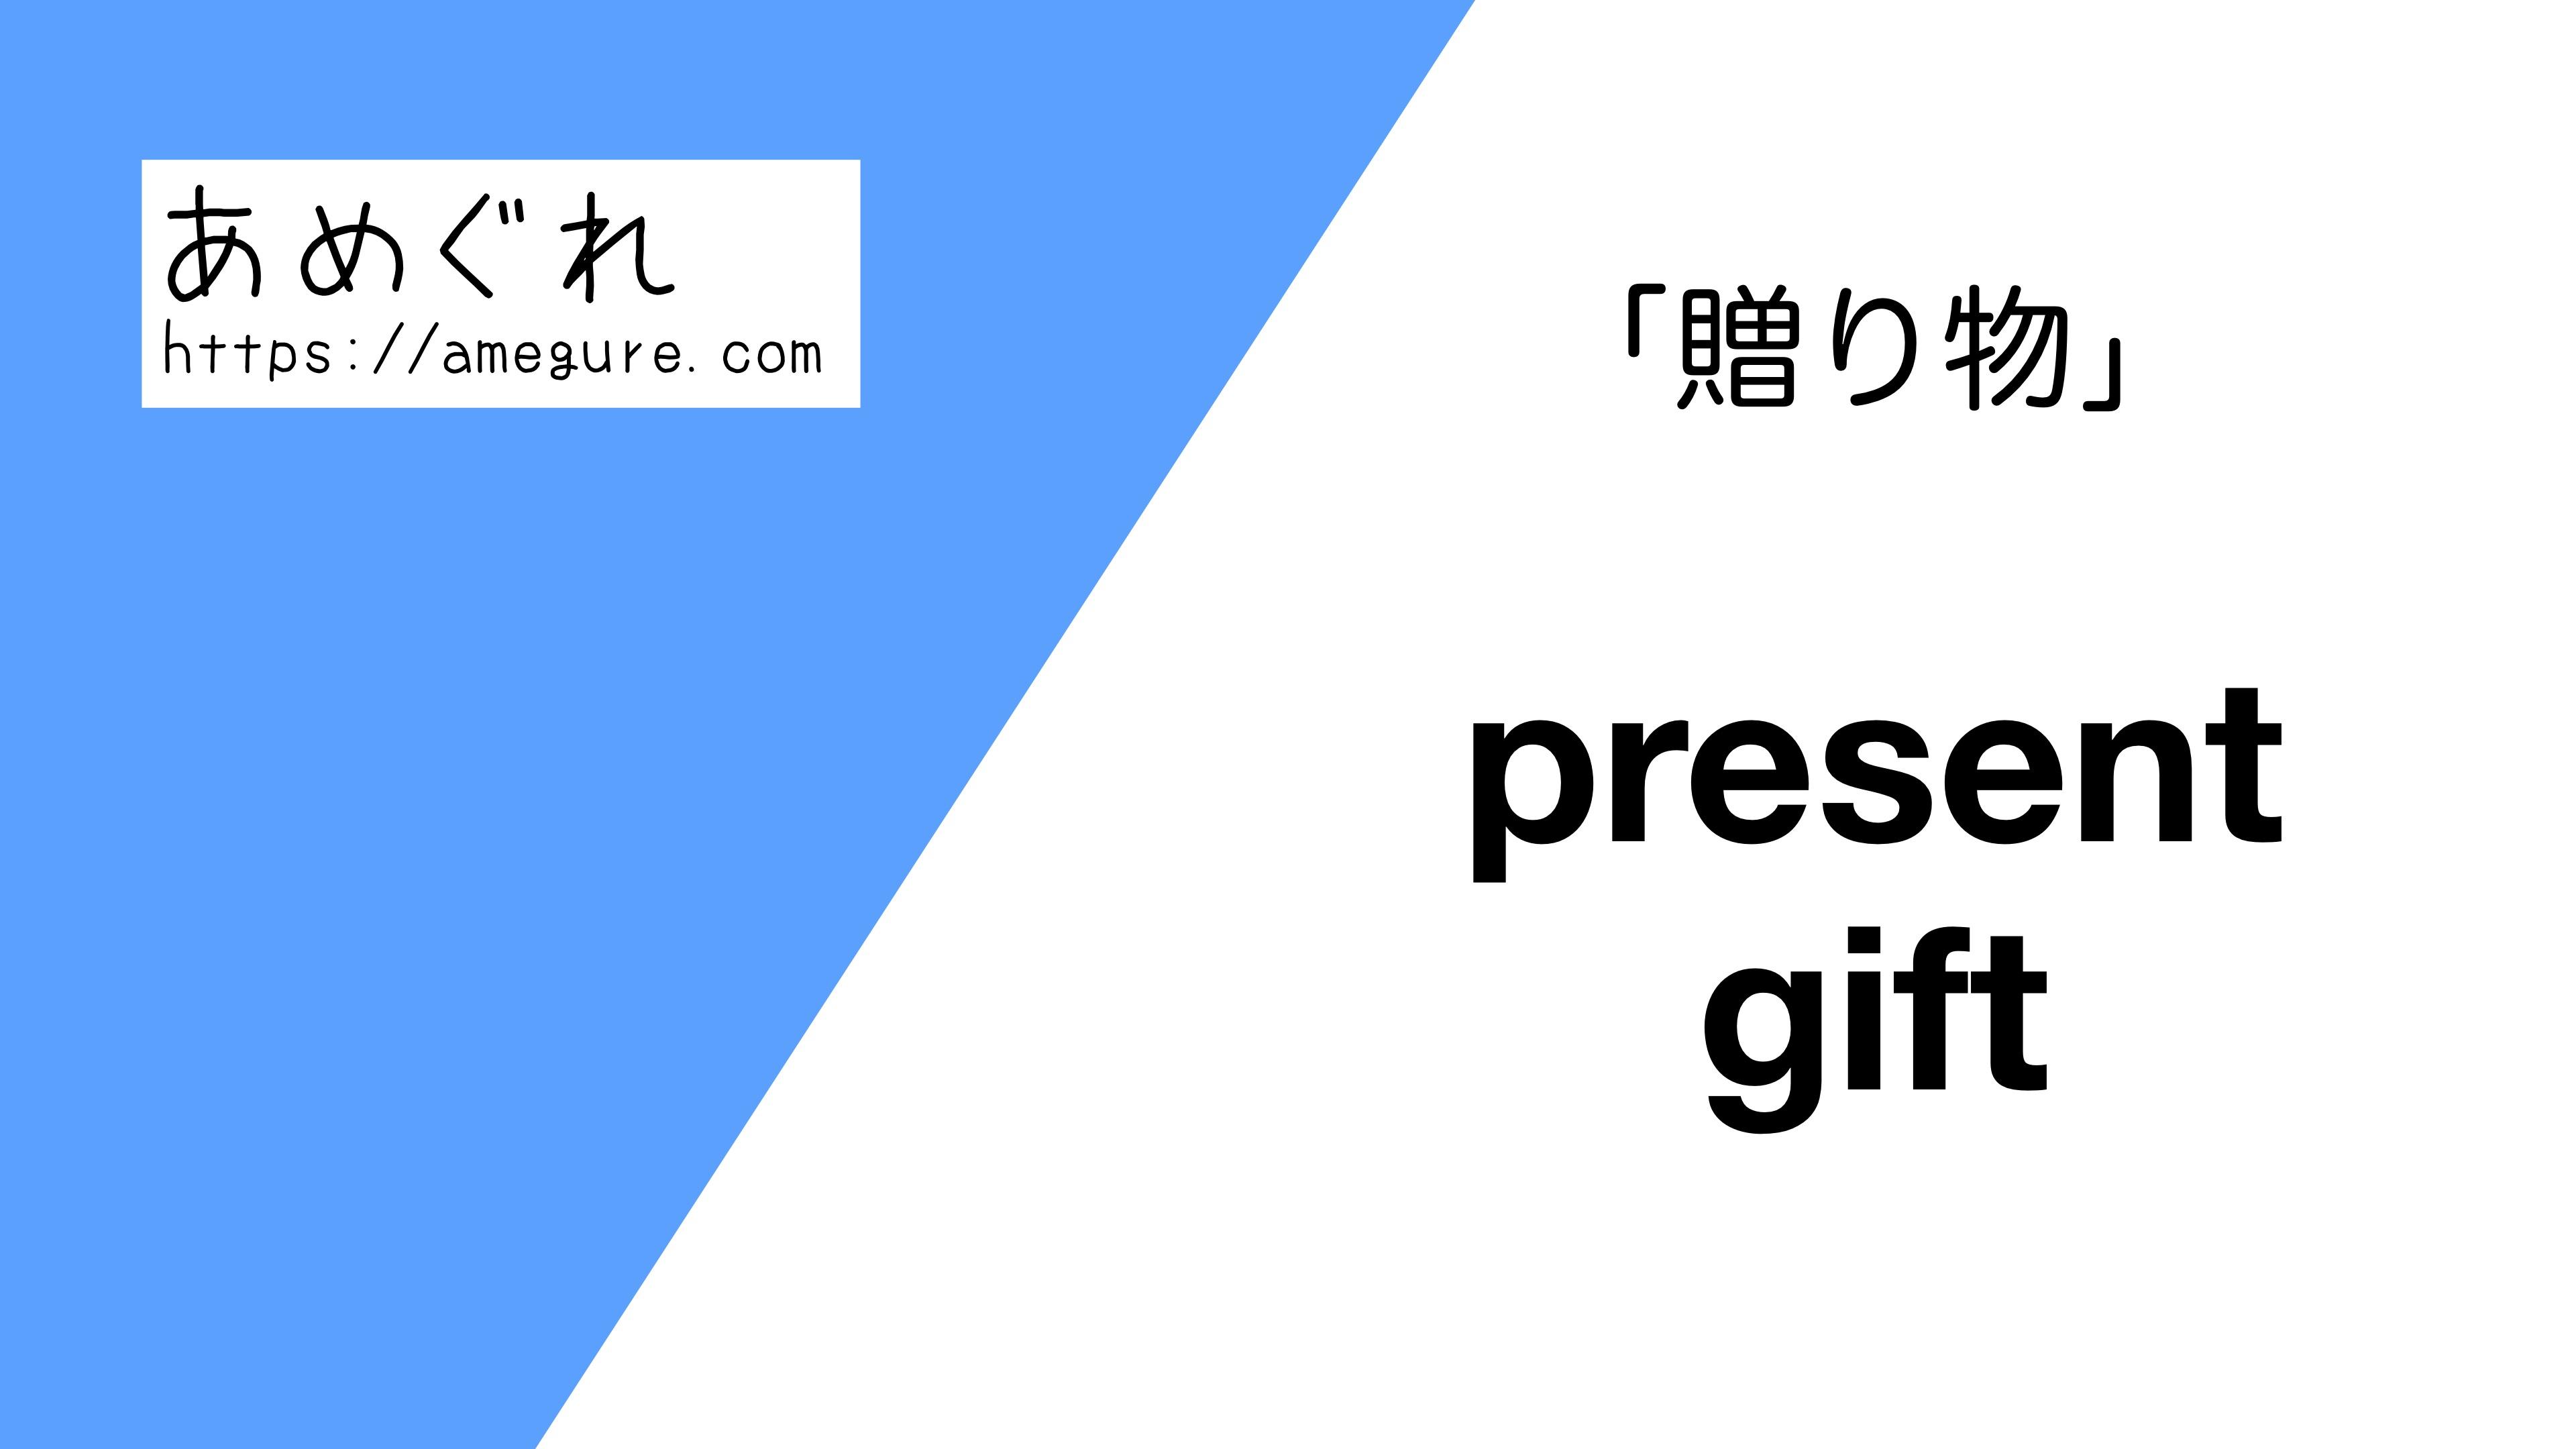 present-gift違い